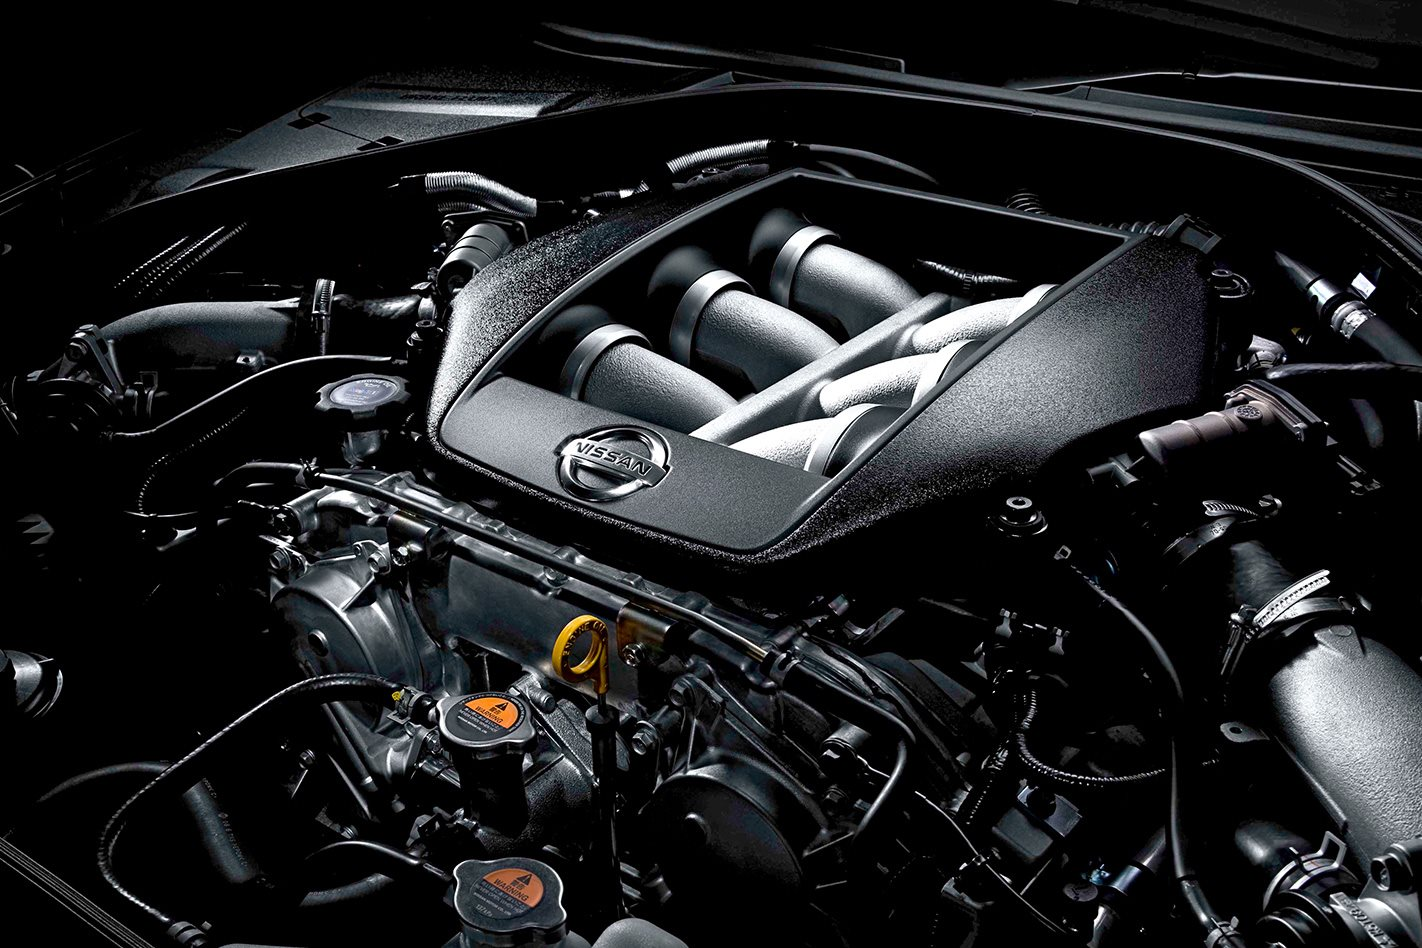 Nissan-GT-R-Spec-V-engine.jpg